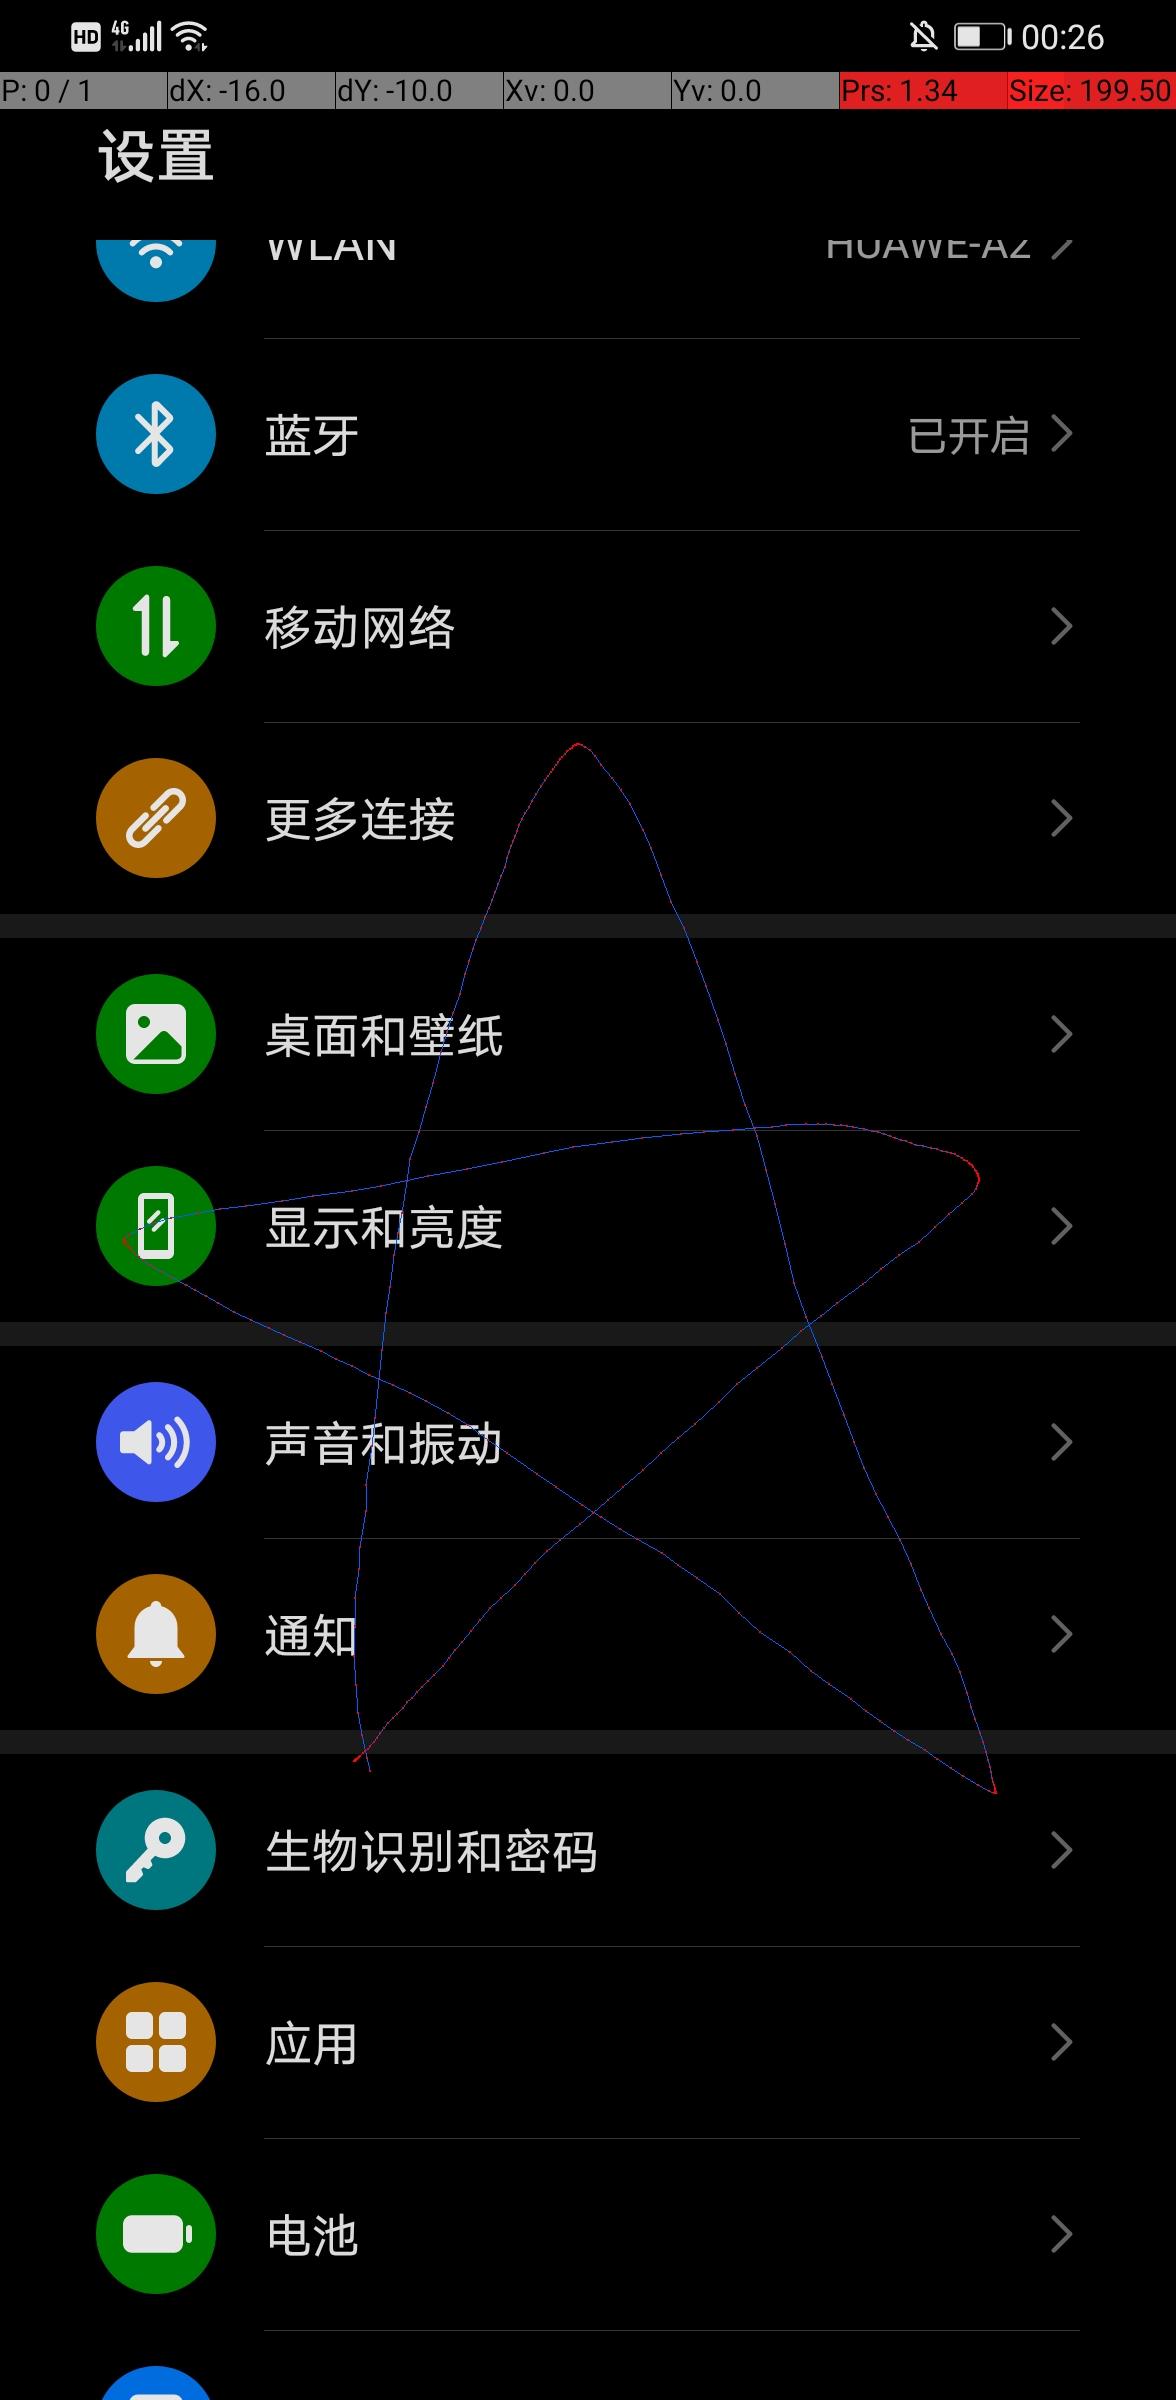 Screenshot_20200523_002626_com.android.settings.jpg